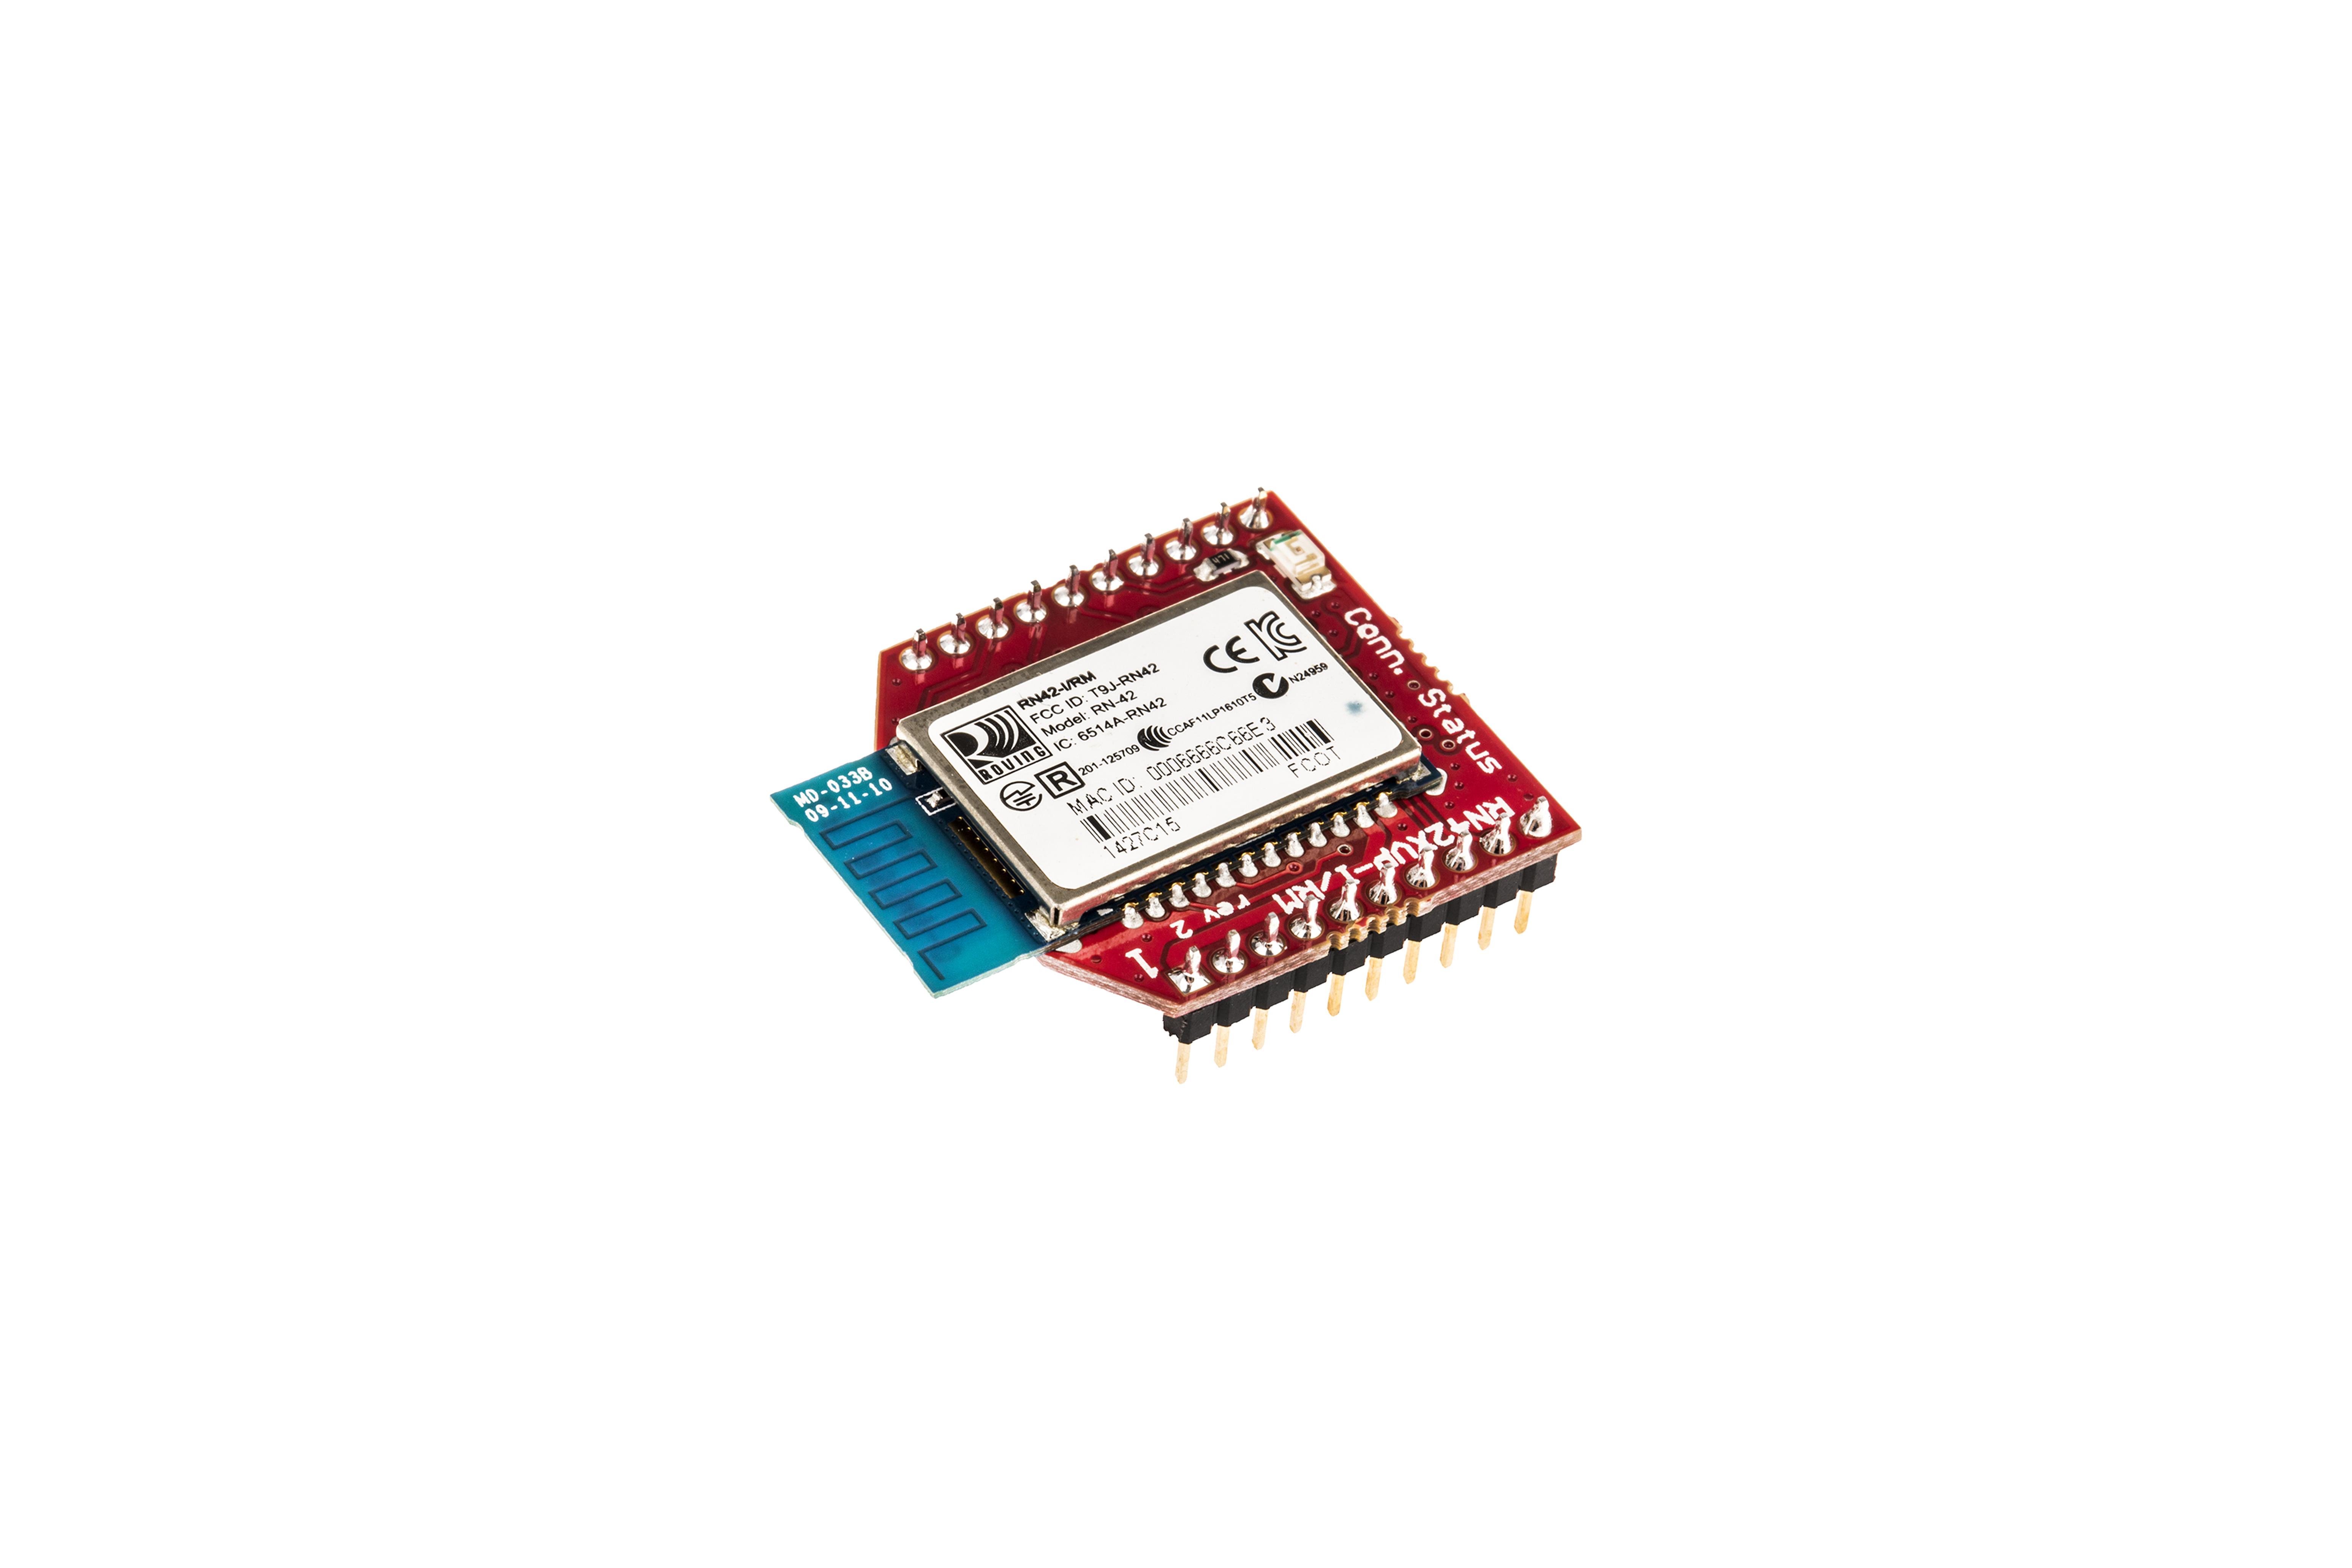 Antenne module socket pour circ. imp.Bluetooth RN42